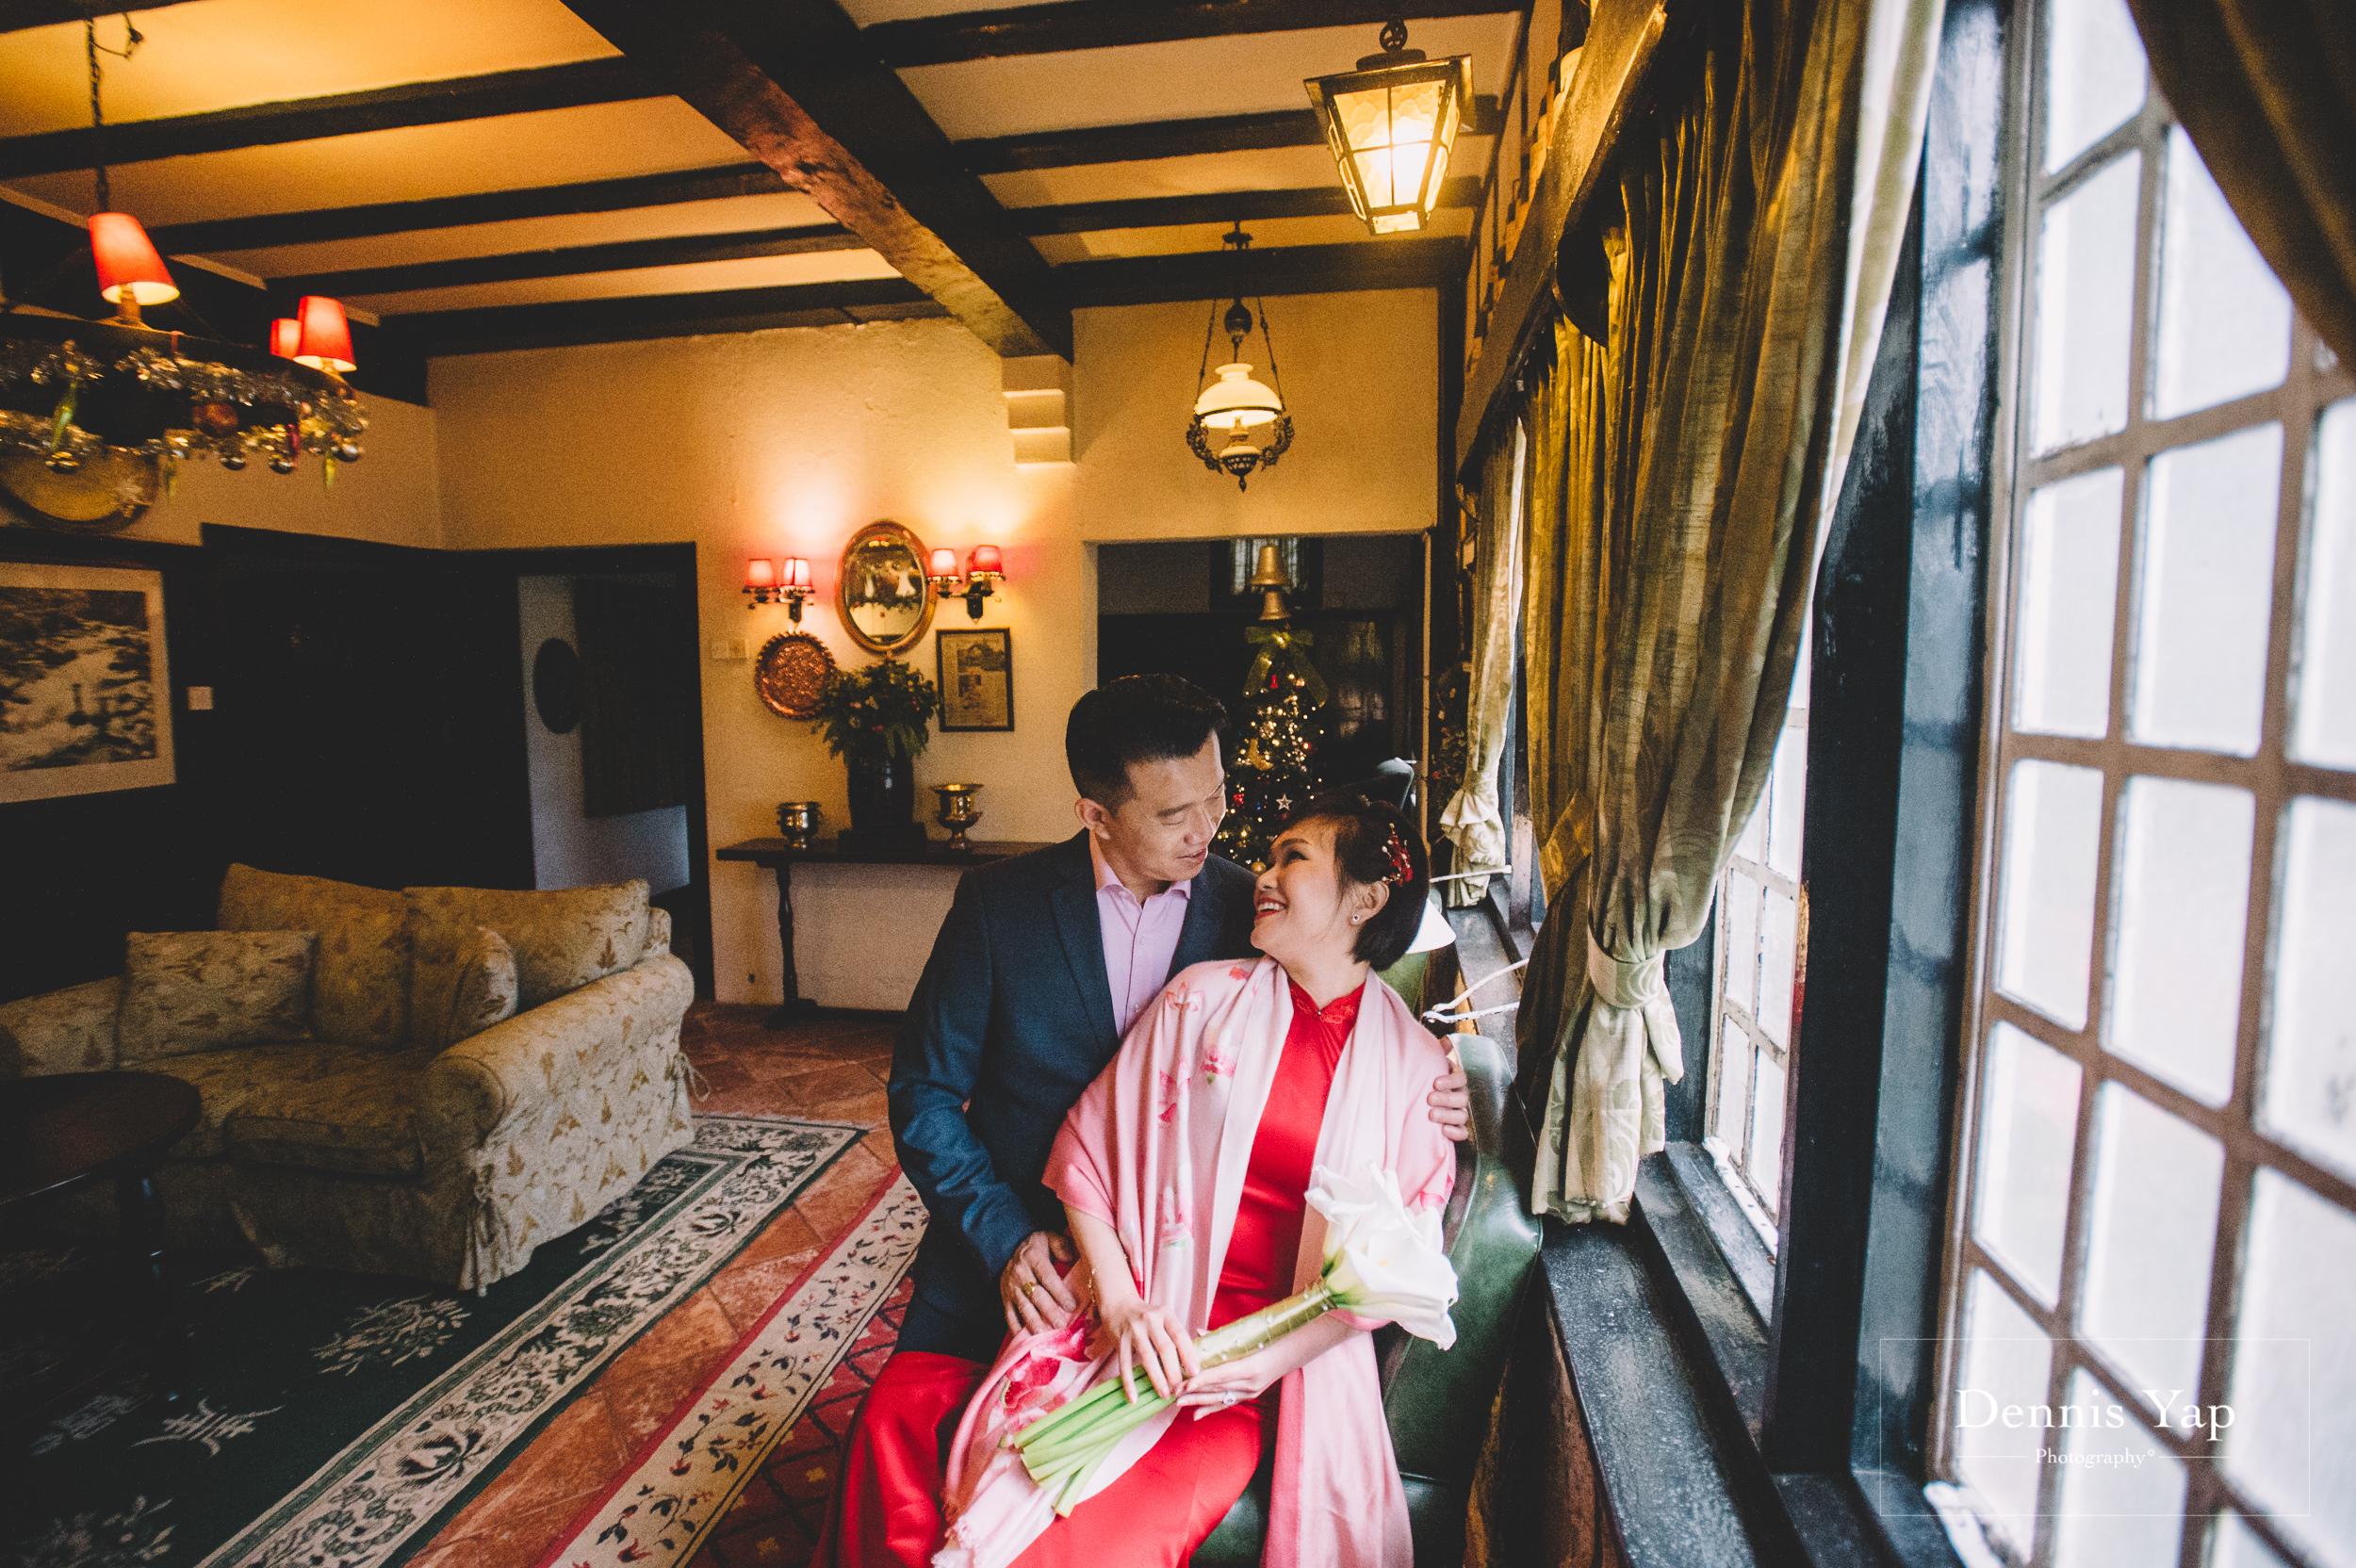 boon weng cyndy love family values pre wedding cameron highlands smoke house dennis yap photography-76.jpg